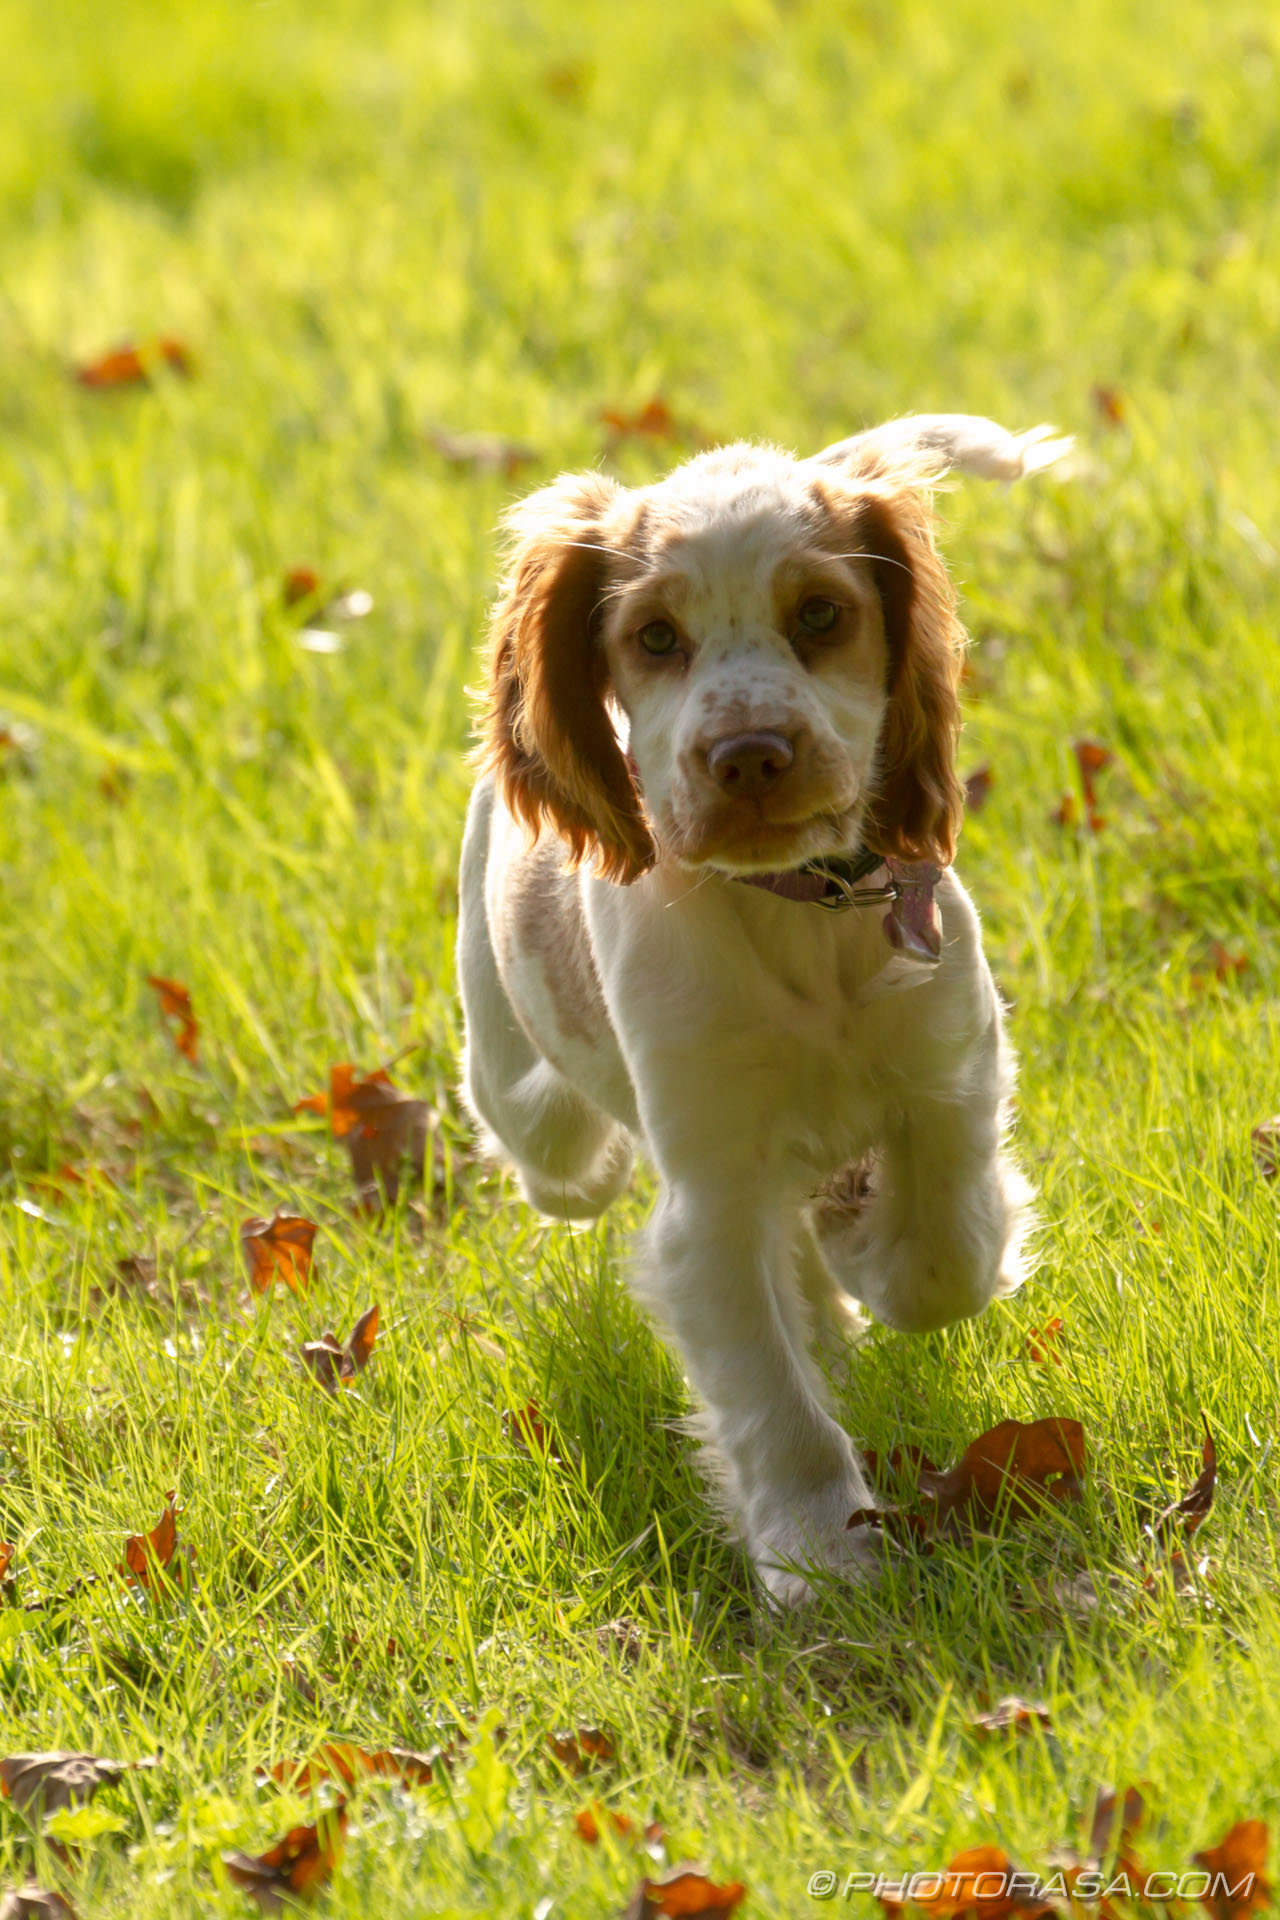 http://photorasa.com/spaniel-puppy-playing-sun/paw-up/